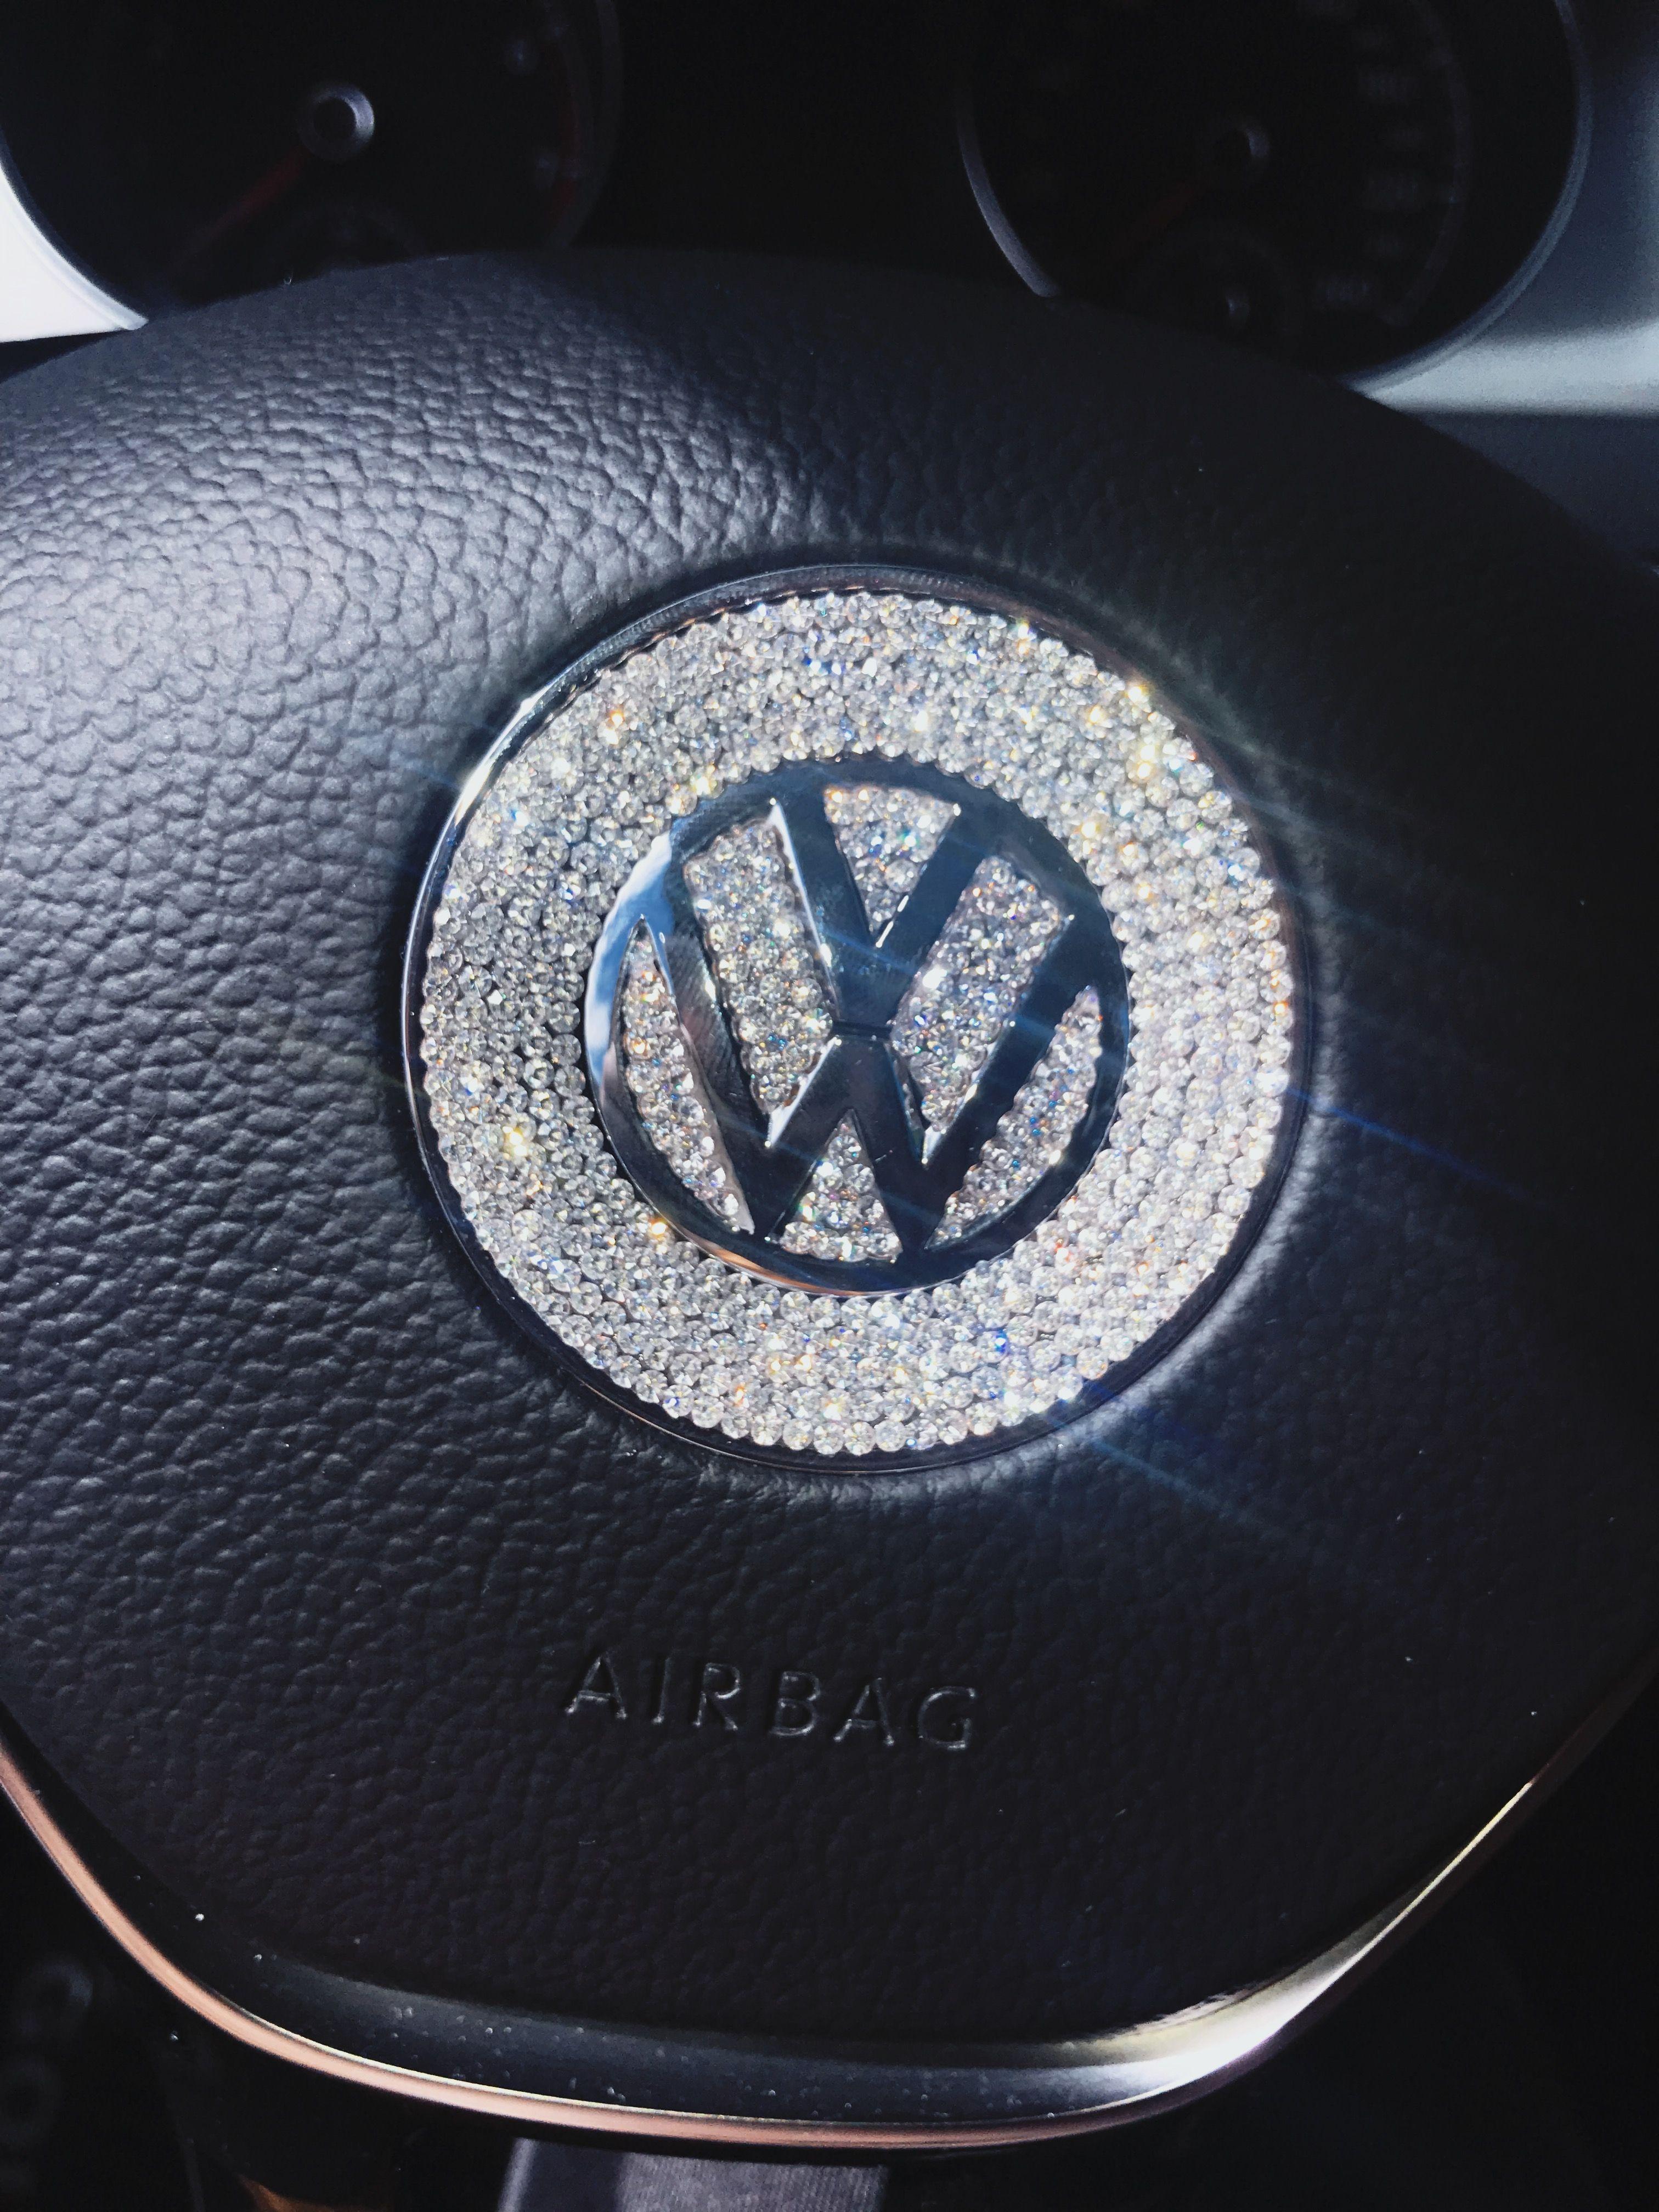 Bling Vw Volkswagen Emblem For Steering Wheel Logo Sticker Decal Beetle Wheel Logo Volkswagen Logos [ 4032 x 3024 Pixel ]